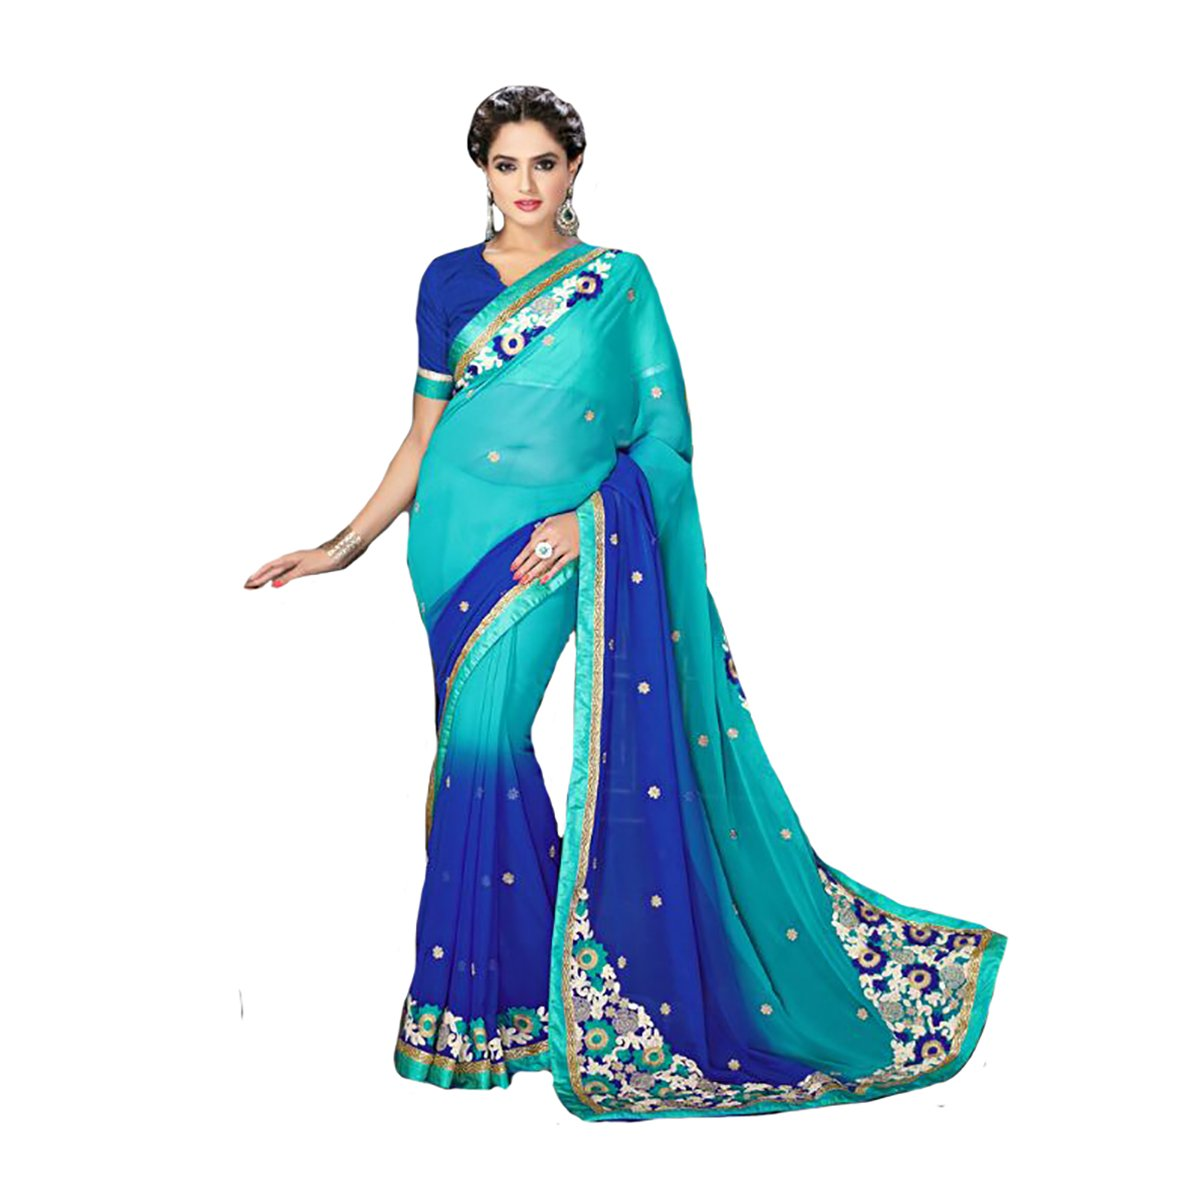 Indian Bridal Wedding Sari Saree Designer Work Original Ethnic Traditional WhiteSexy New